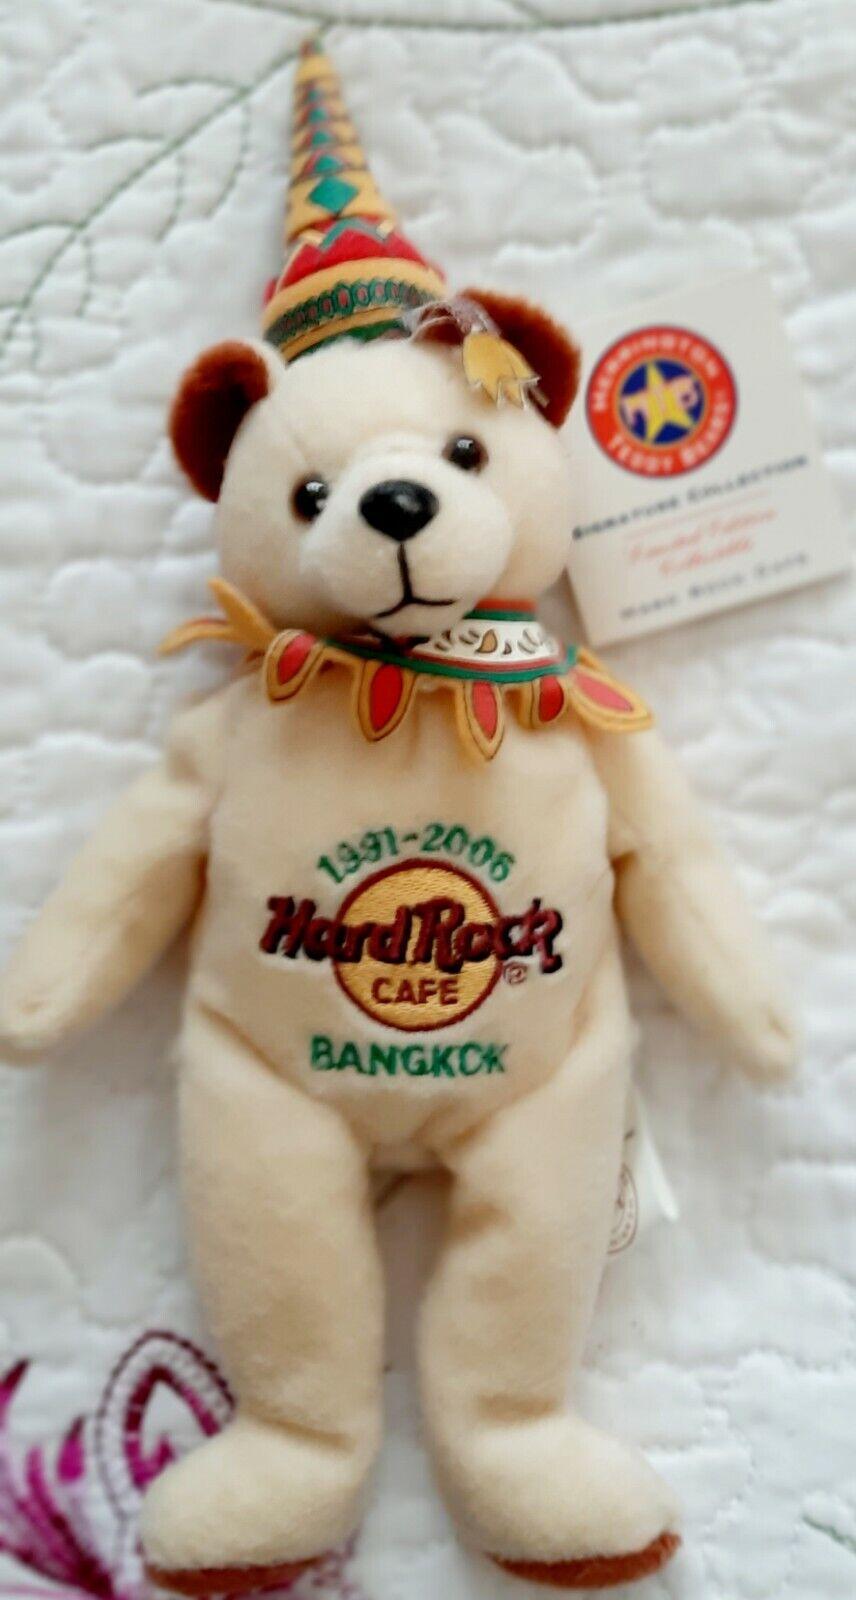 Hard Rock Cafe Bankok Bear